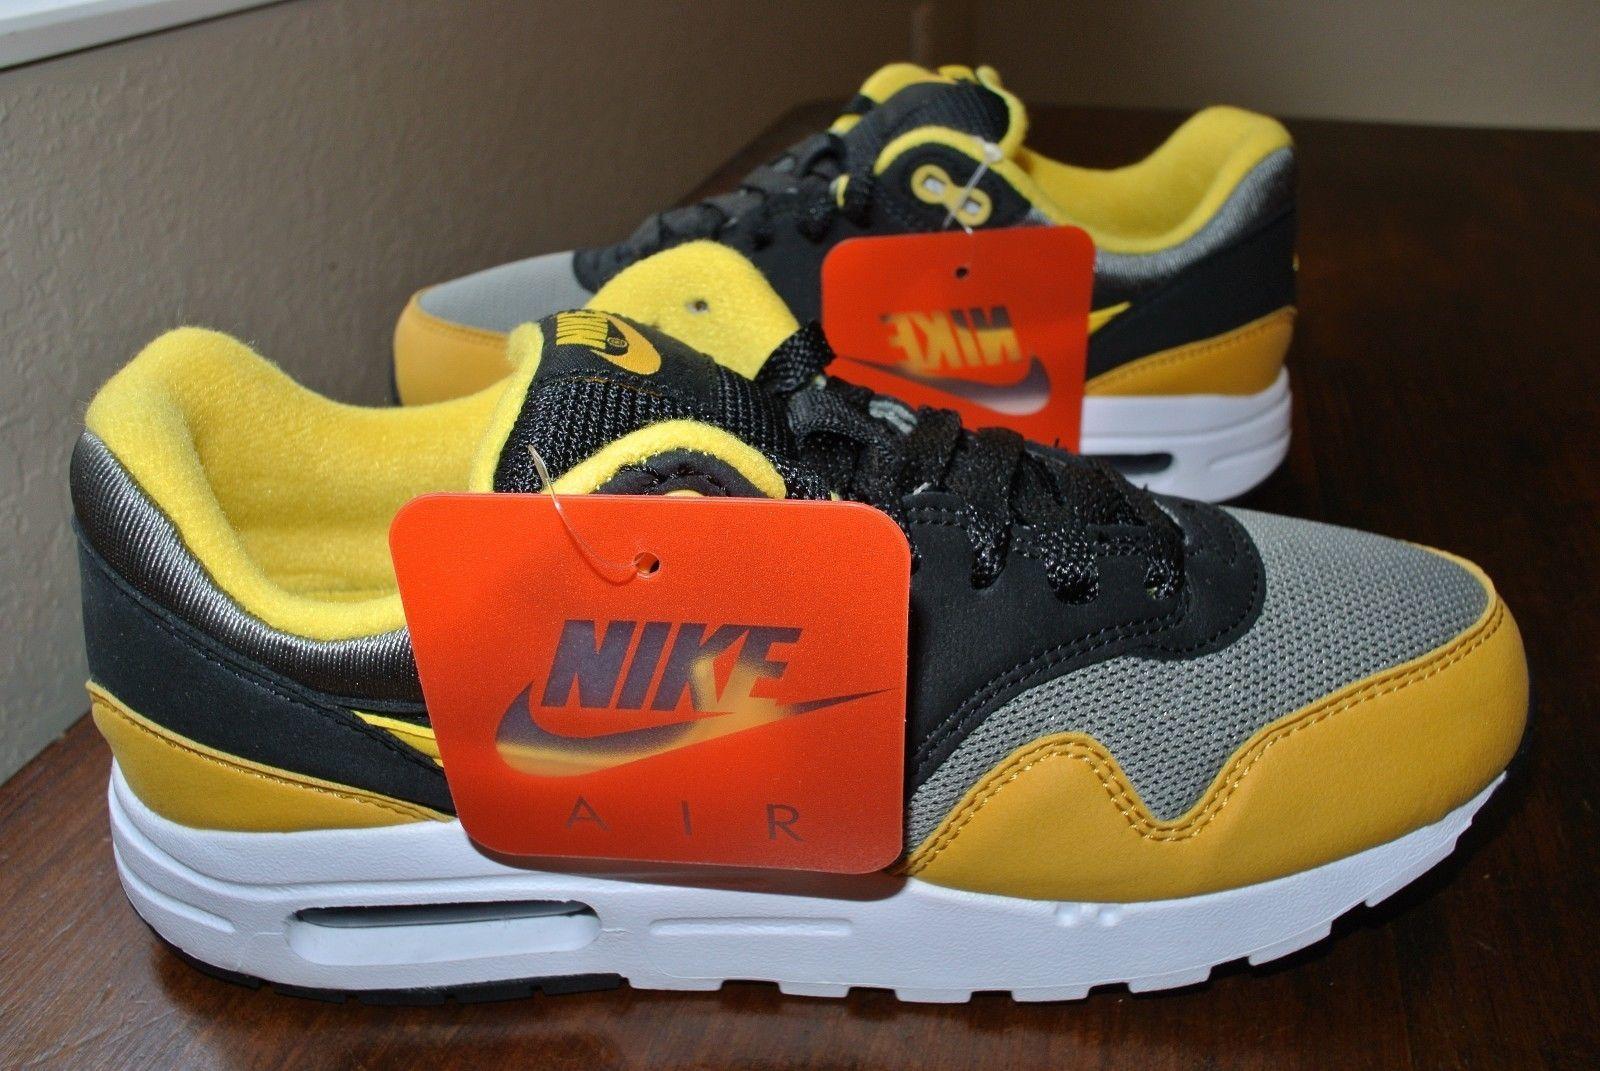 Nike Air Max 1 (Gs) Youth Black Yellow Grey and similar items